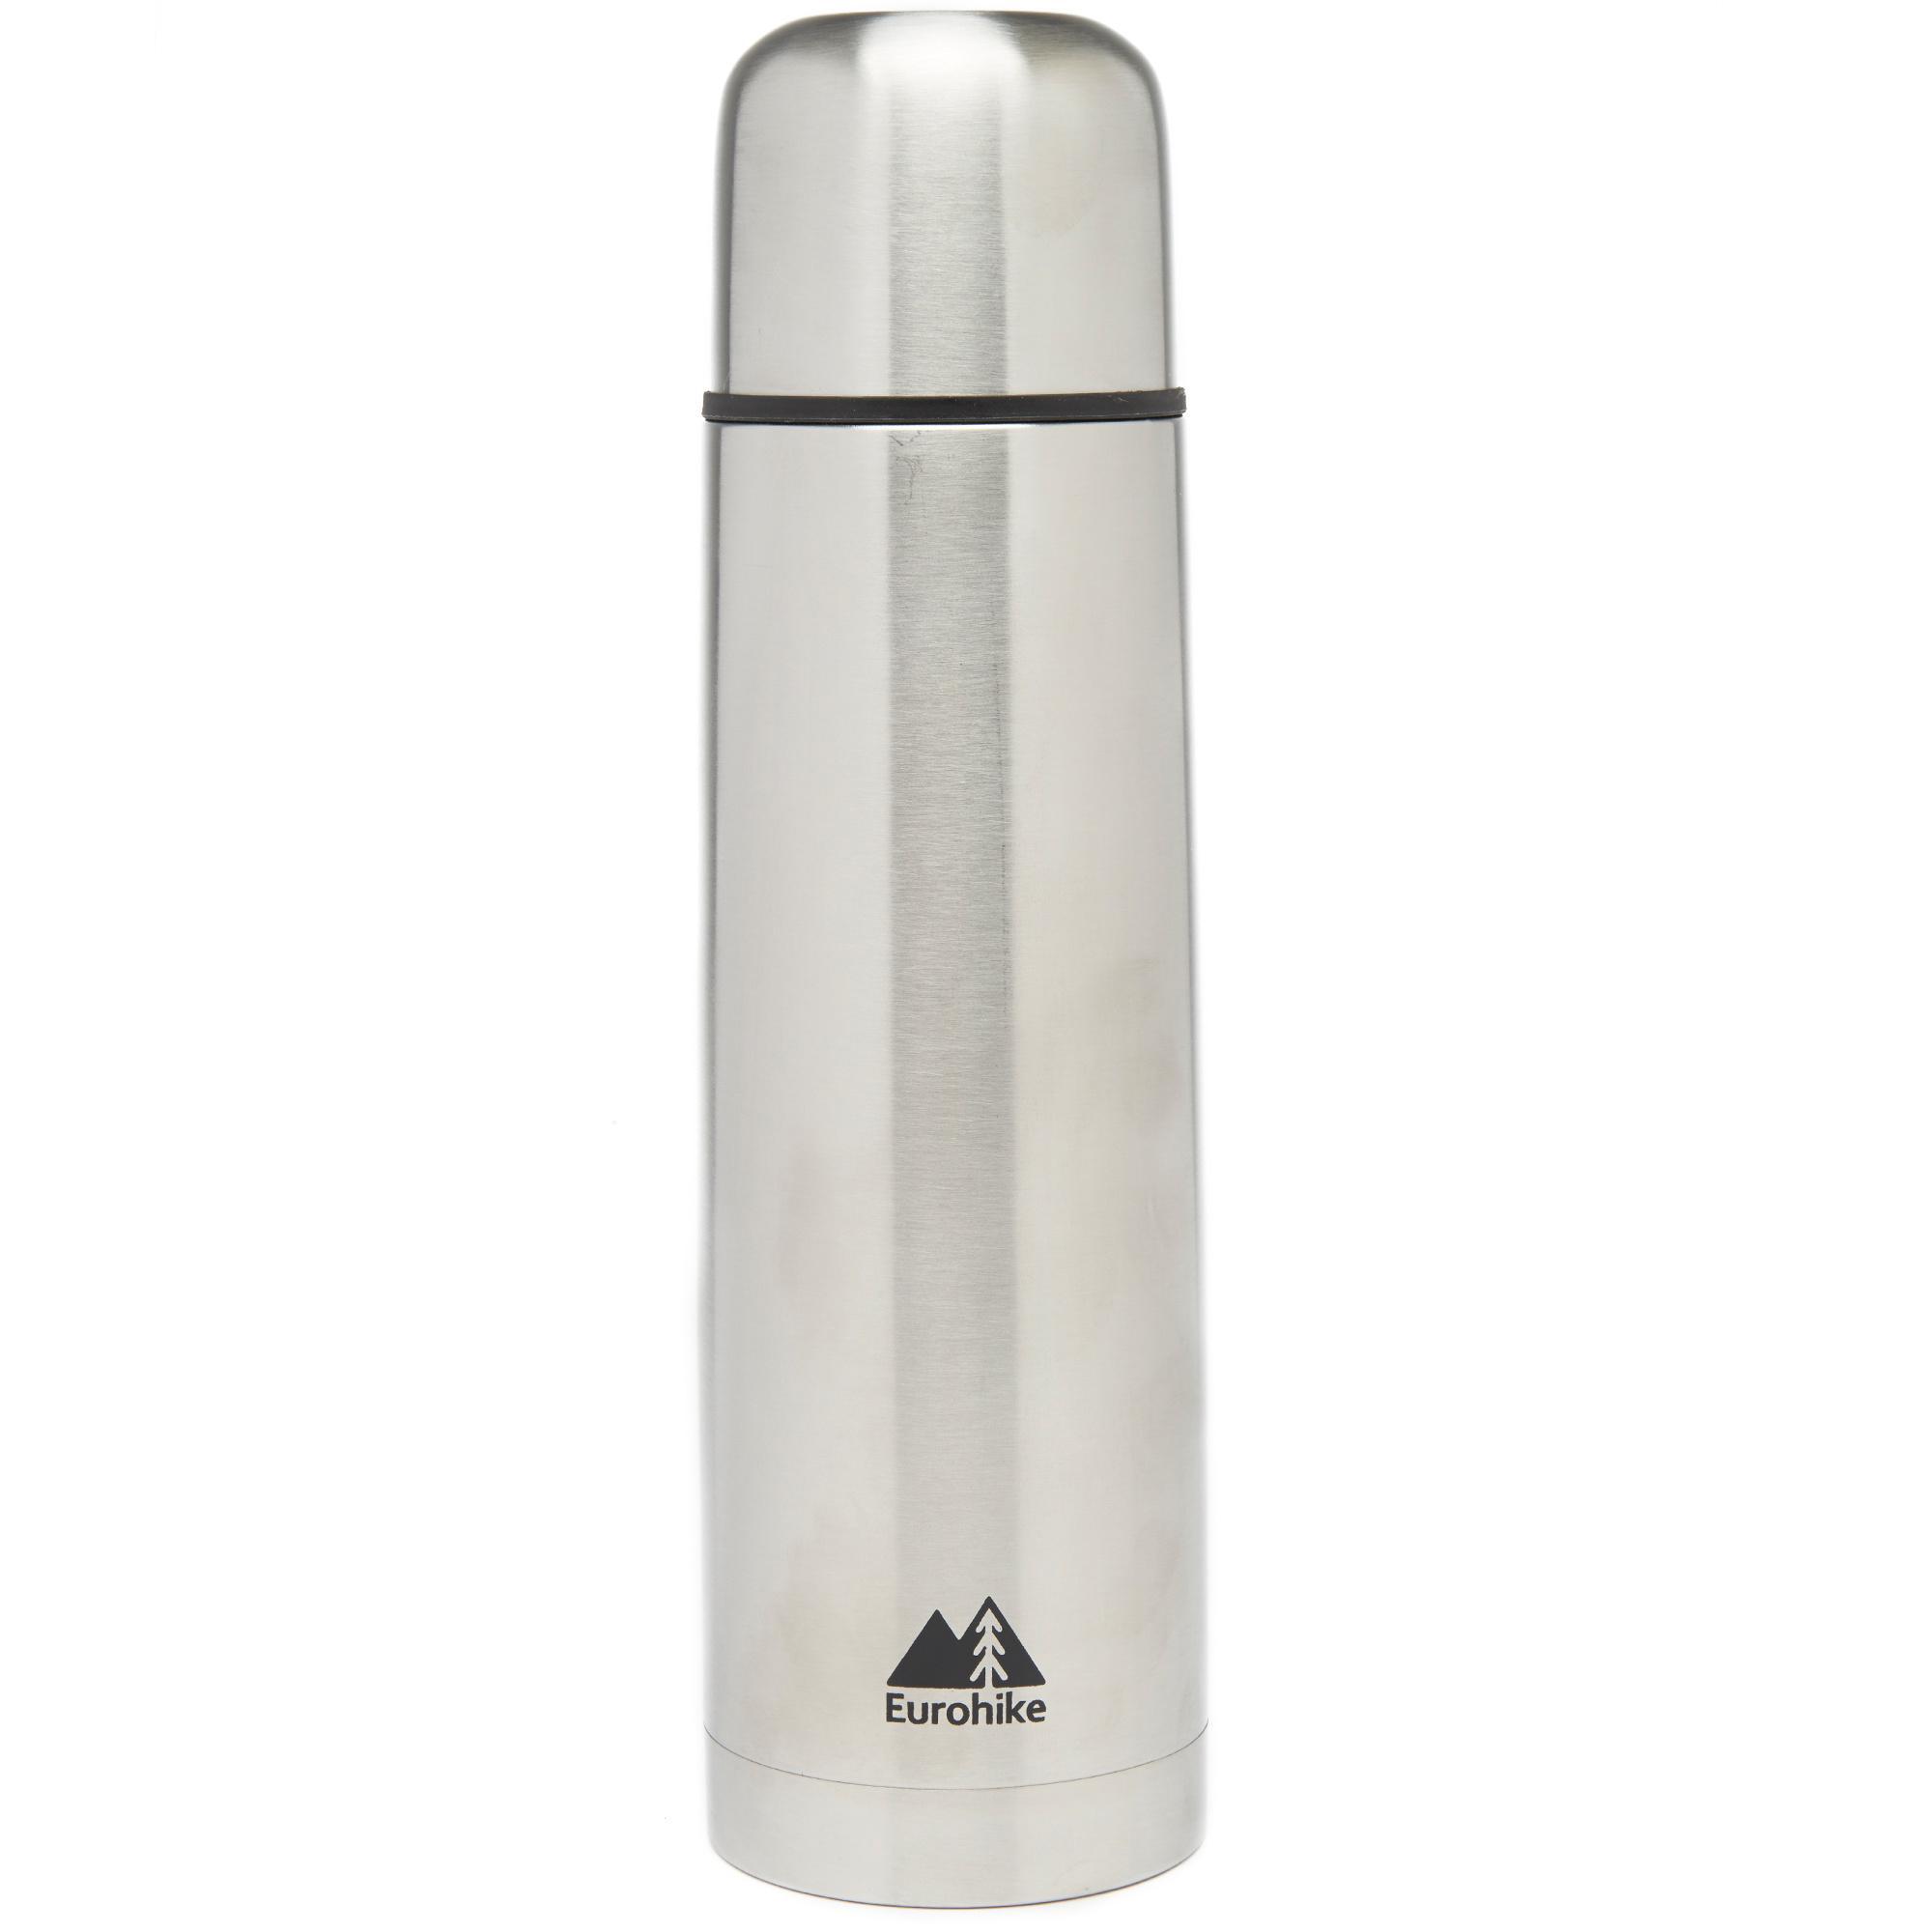 Eurohike Stainless Steel Flask 500ml - 500ml/500ml  500ml/500ml